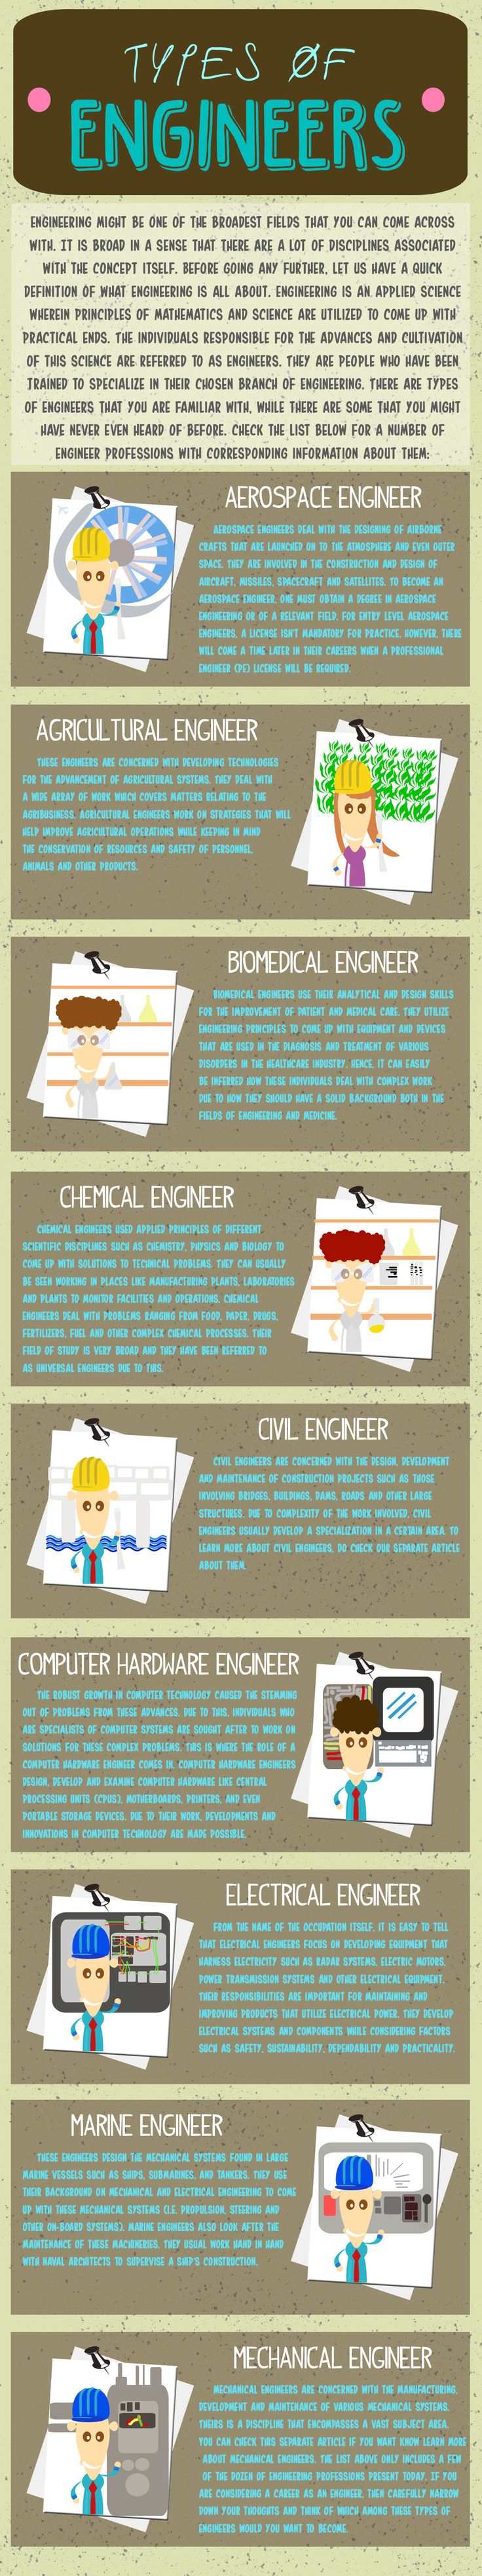 Best 25 Engineering Jobs Ideas On Pinterest Professional Cv